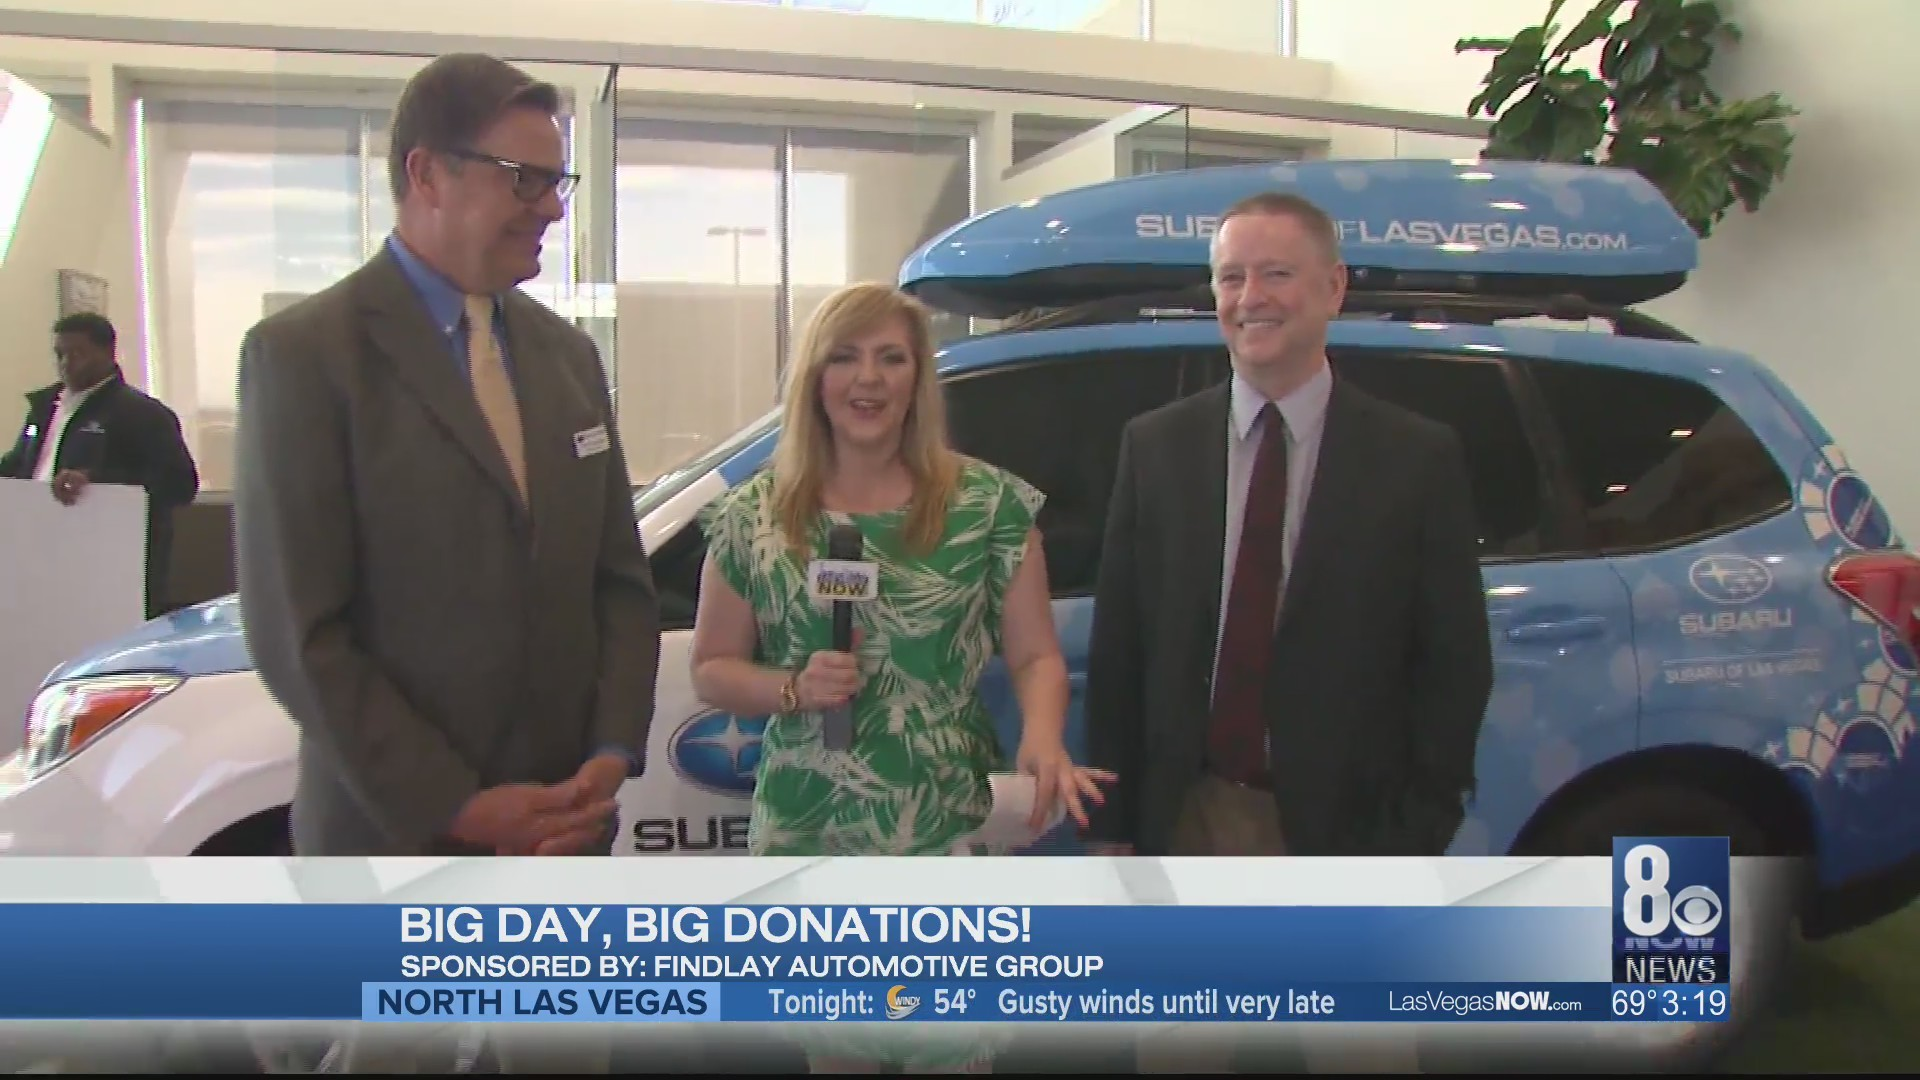 Big day, big donations at Findlay Subaru